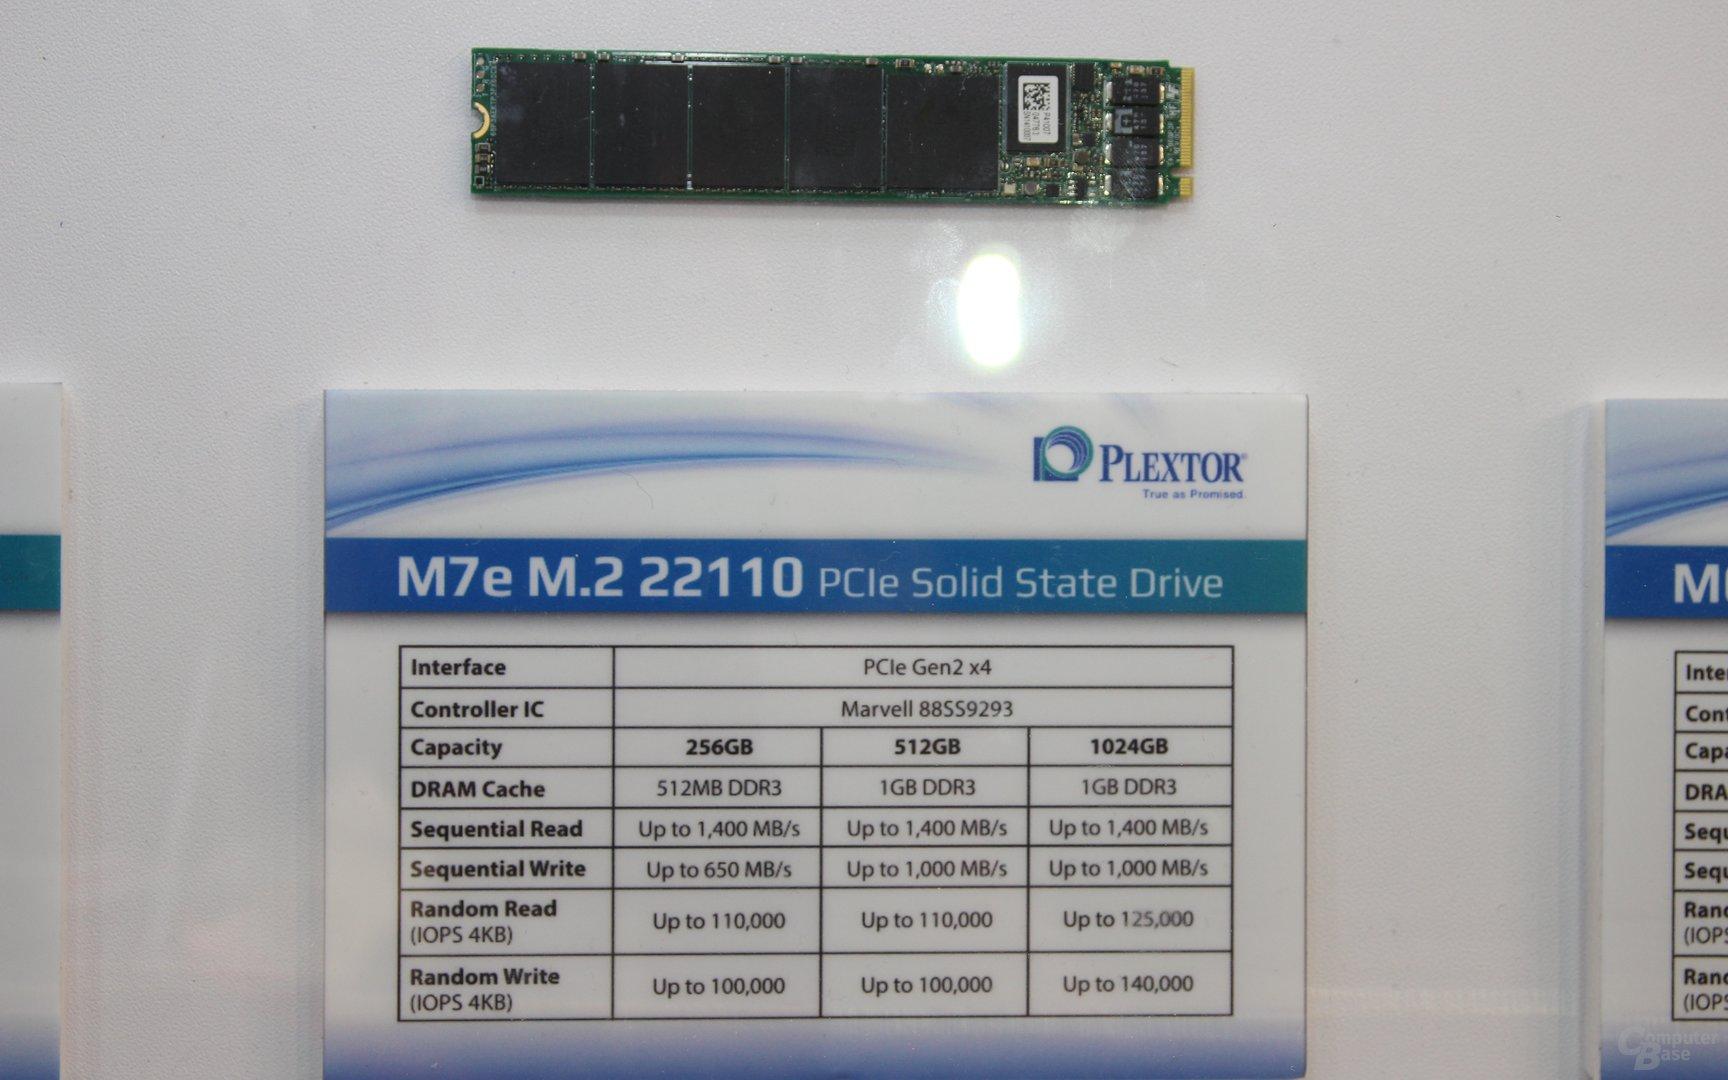 Plextor M7e im Format M.2 22110